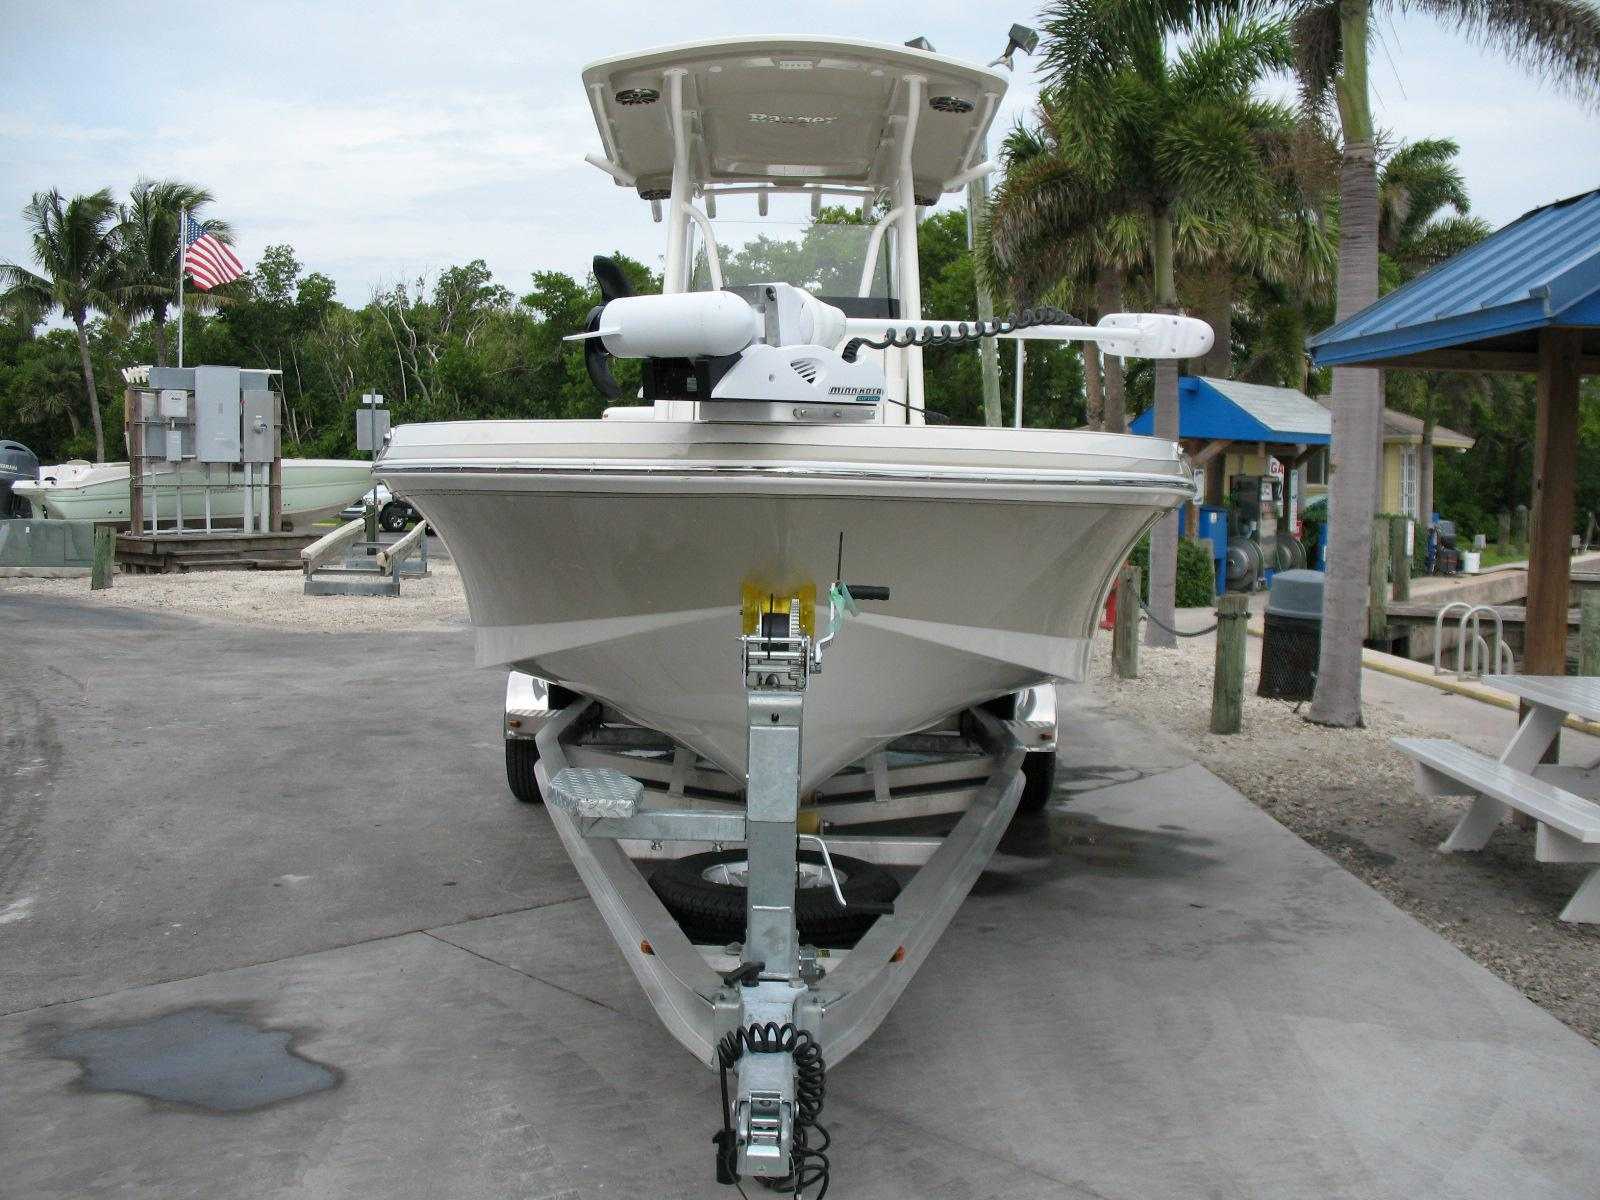 2019 Ranger 2360 Bay For Sale In Stuart Jensen Beach Fl Sundance Trailer Wiring Harness Cruise America Marine 772 675 1913